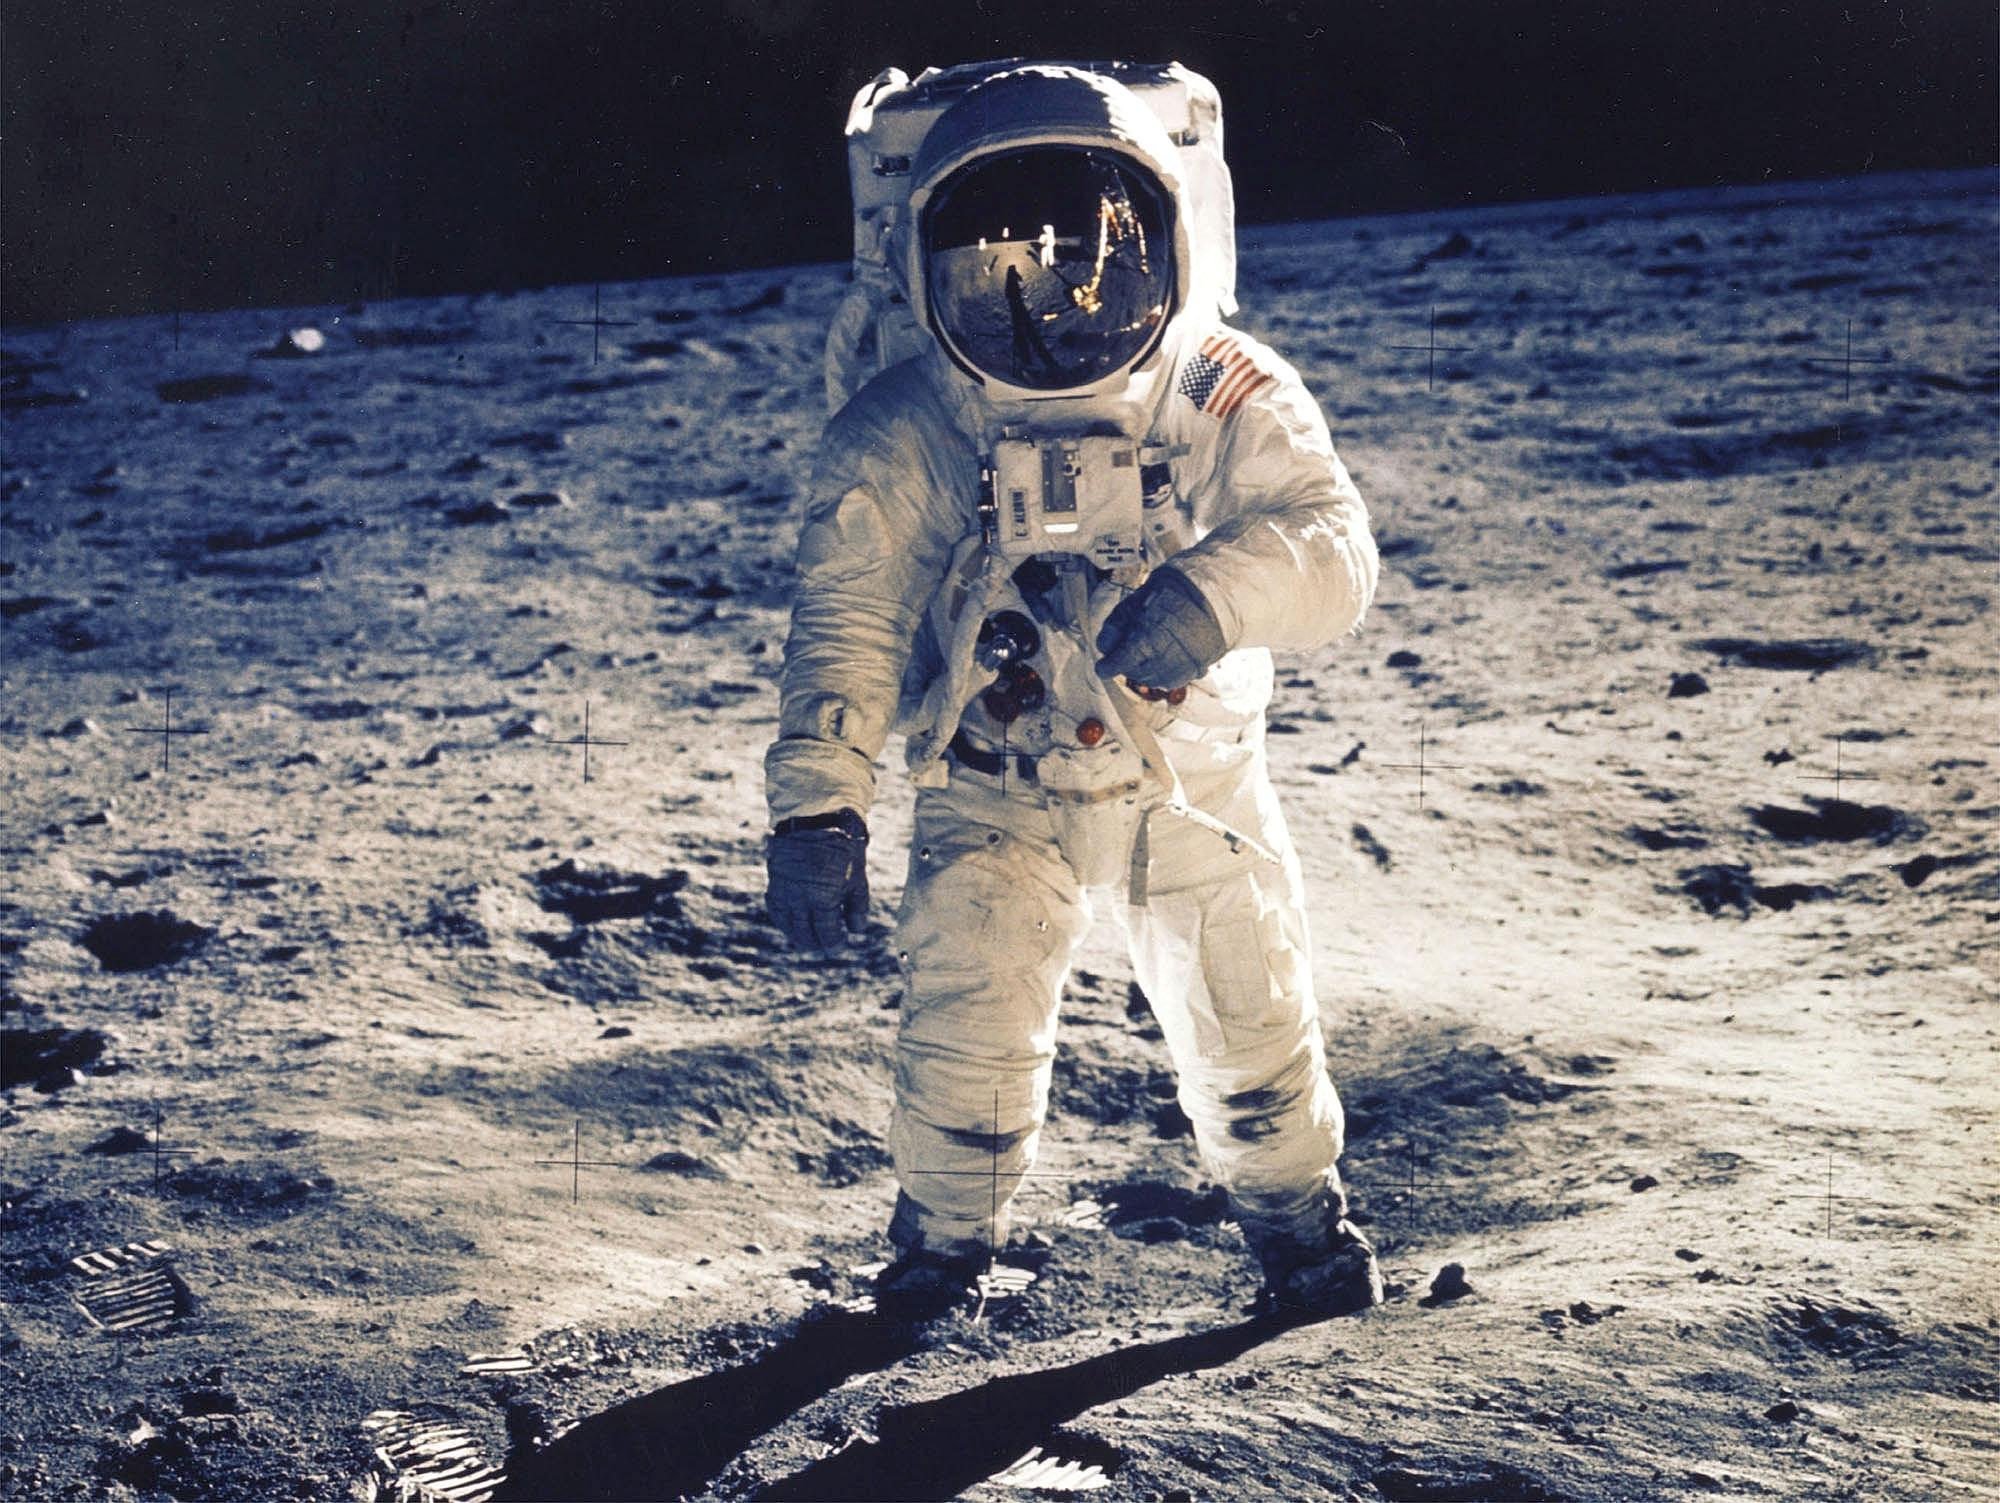 Moon landing mystery: Did Buzz Aldrin really play Frank Sinatra on the moon?